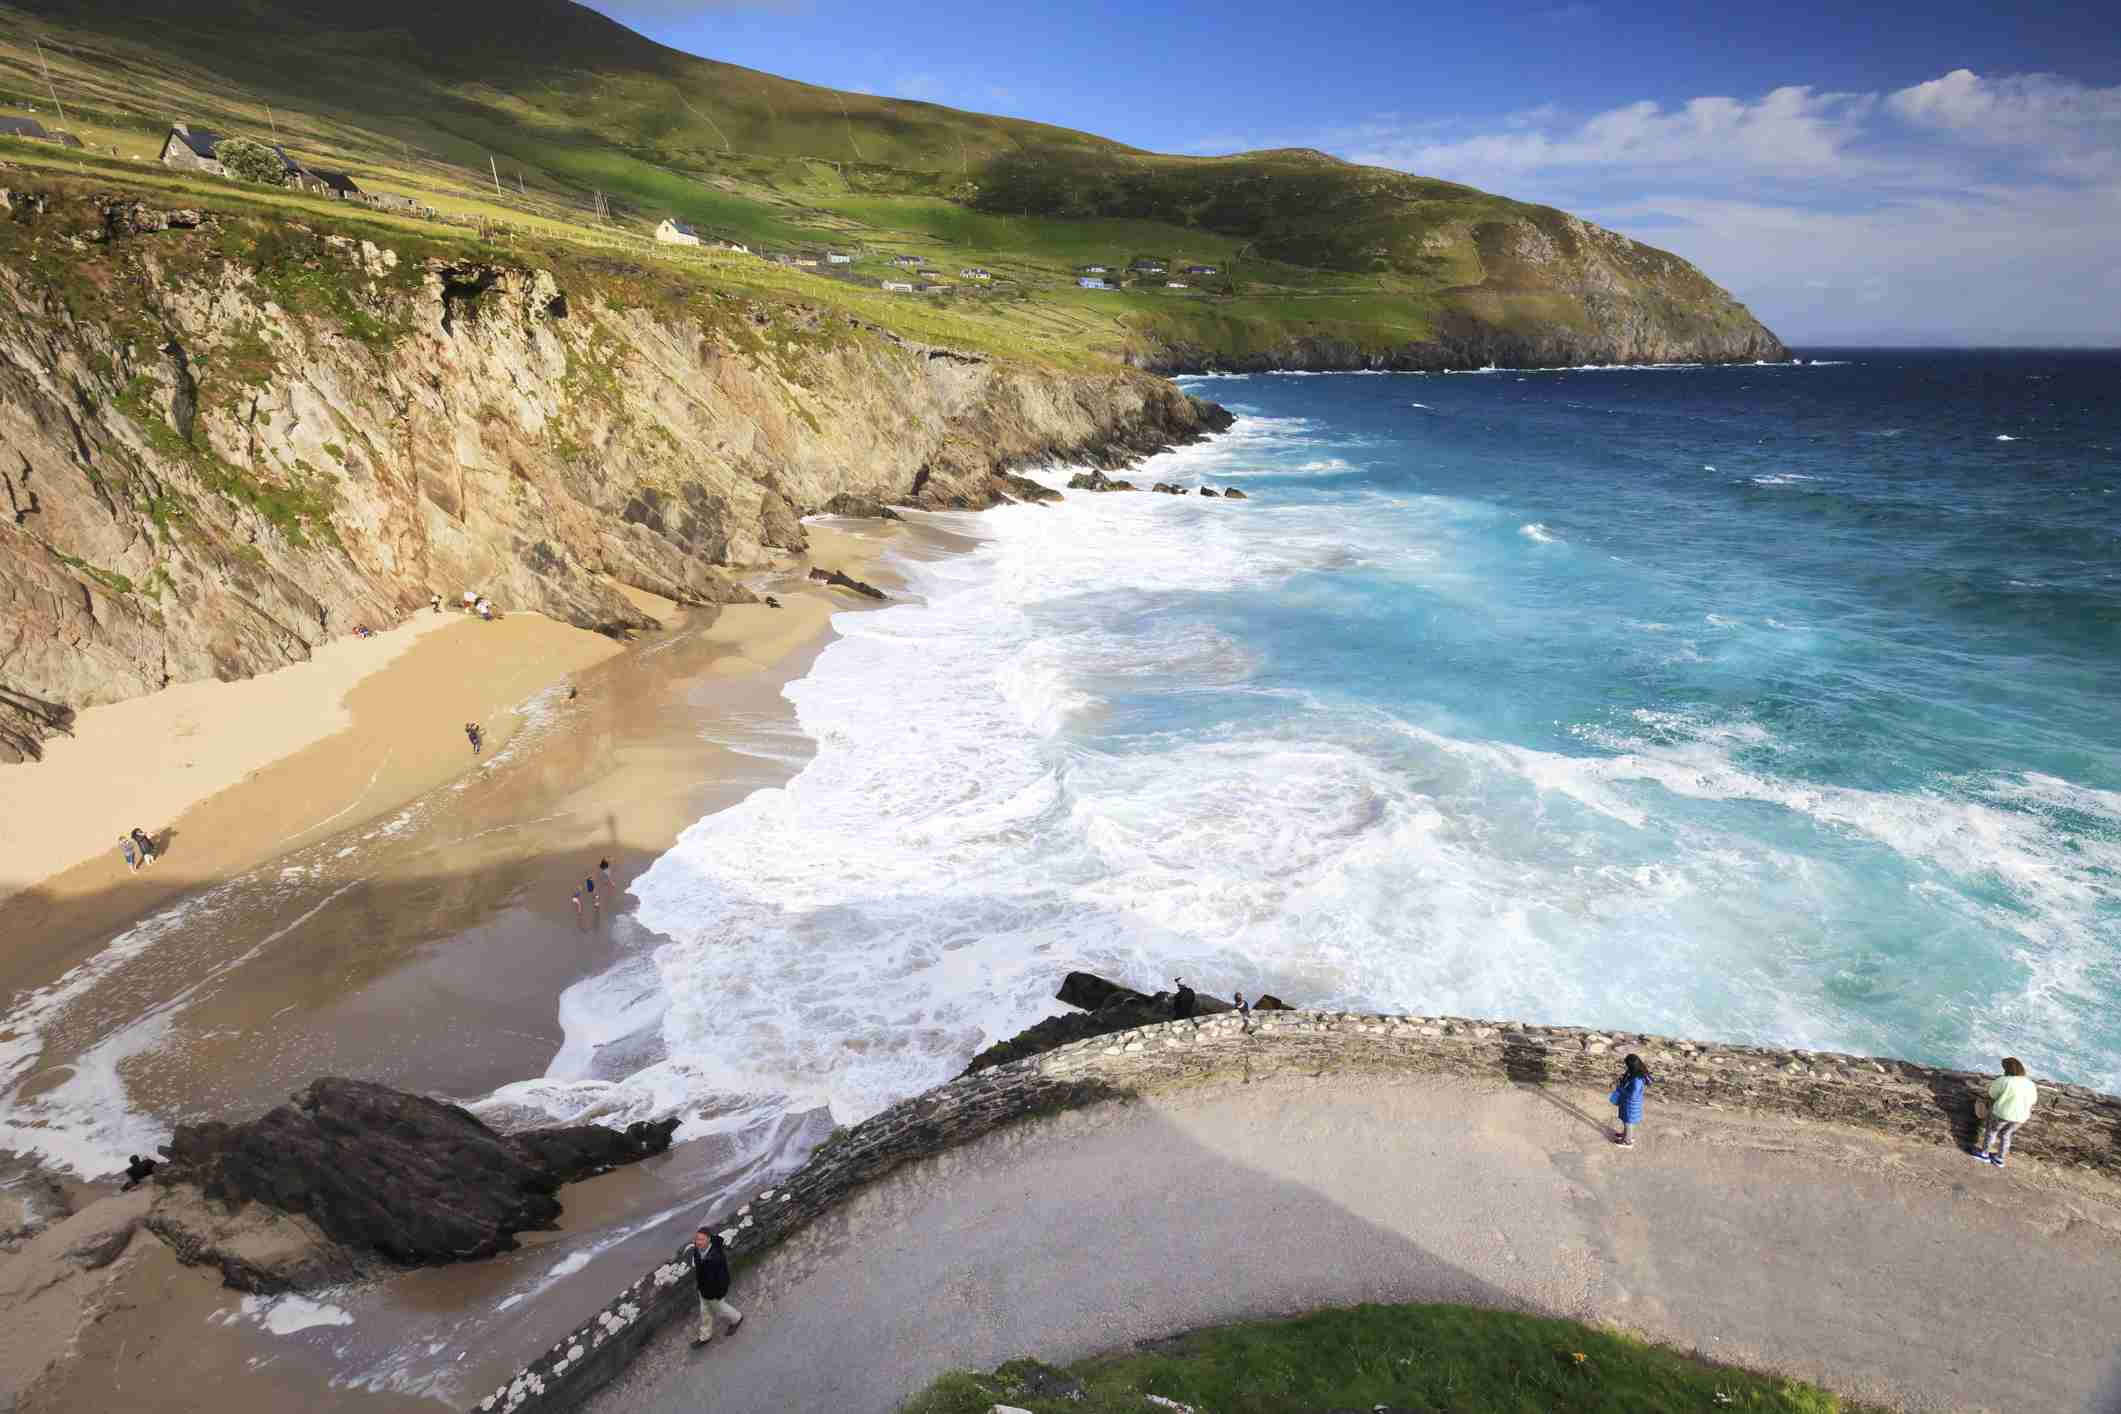 beach at Sea Head, Dingle peninsula, ireland